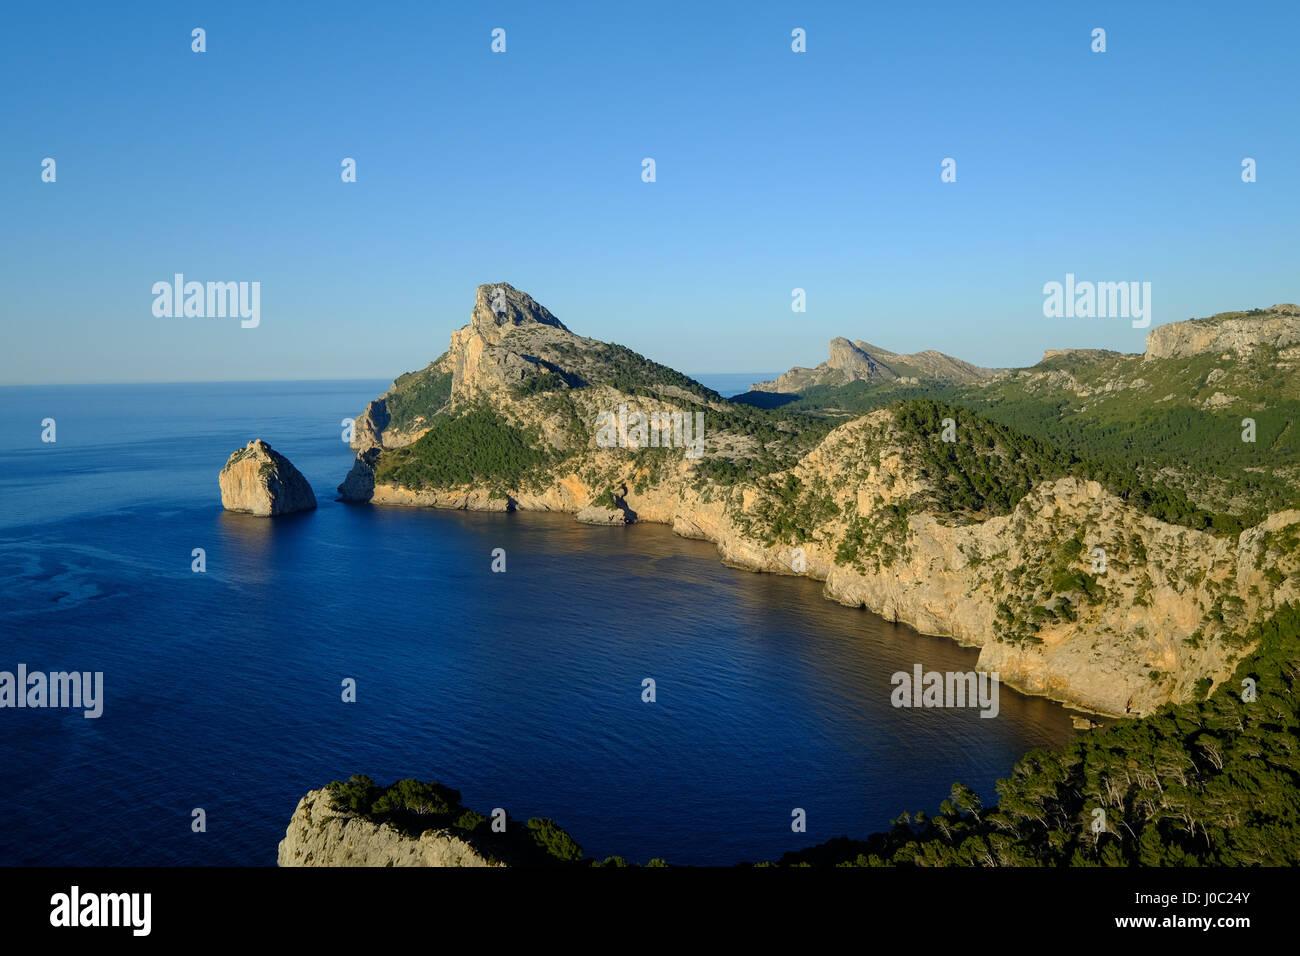 Punta Nau seen from el Mirador Es Colomer in the Formentor Peninsula, Majorca, Balearic Islands, Spain, Mediterranean - Stock Image